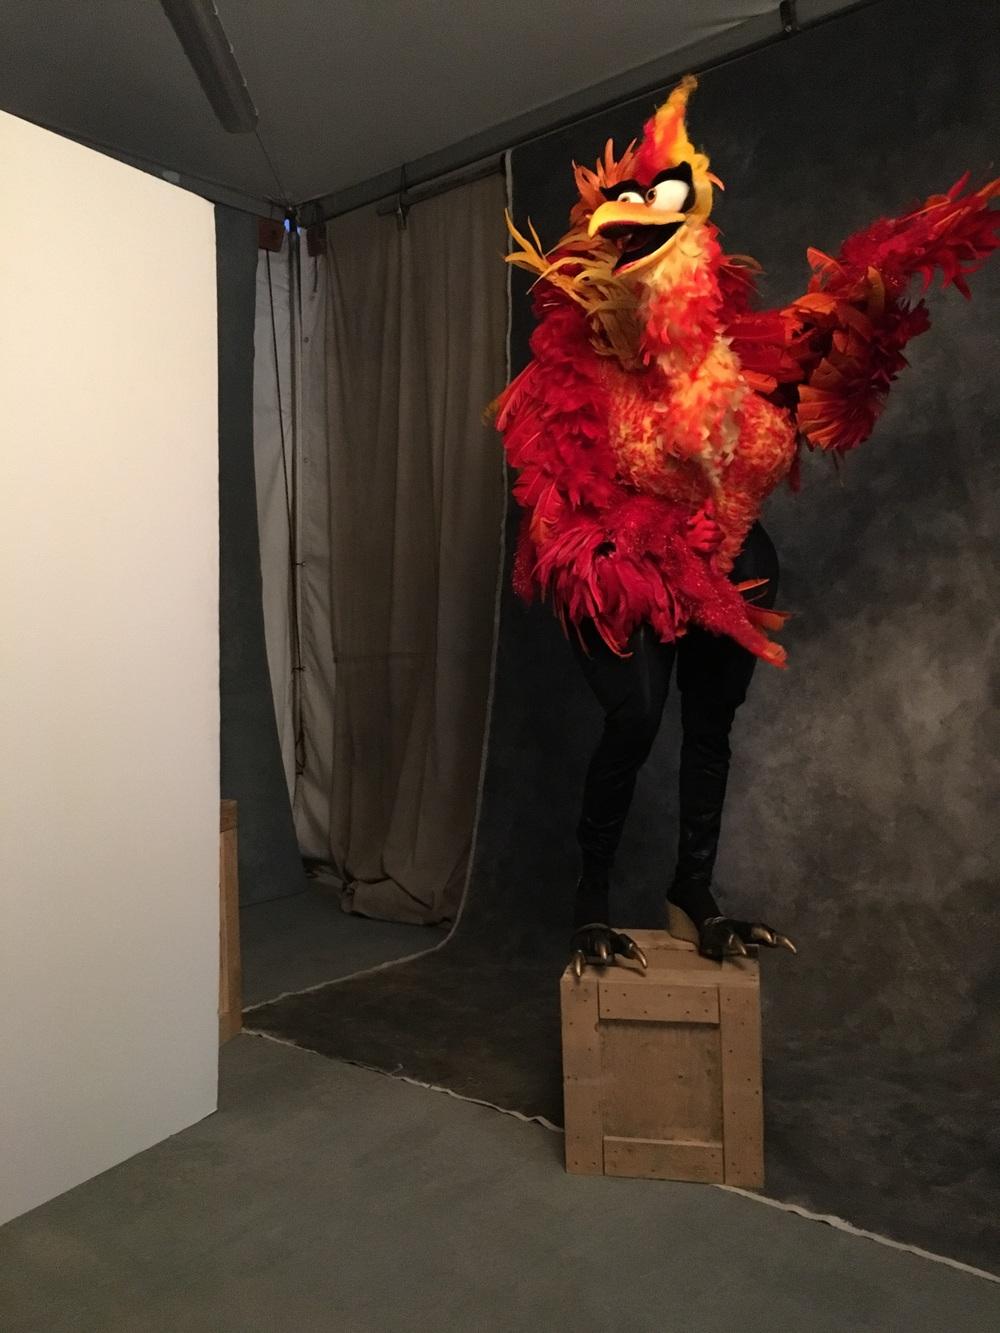 Miss Fuego Firebird shooting with Andrew Haagen at Coachella